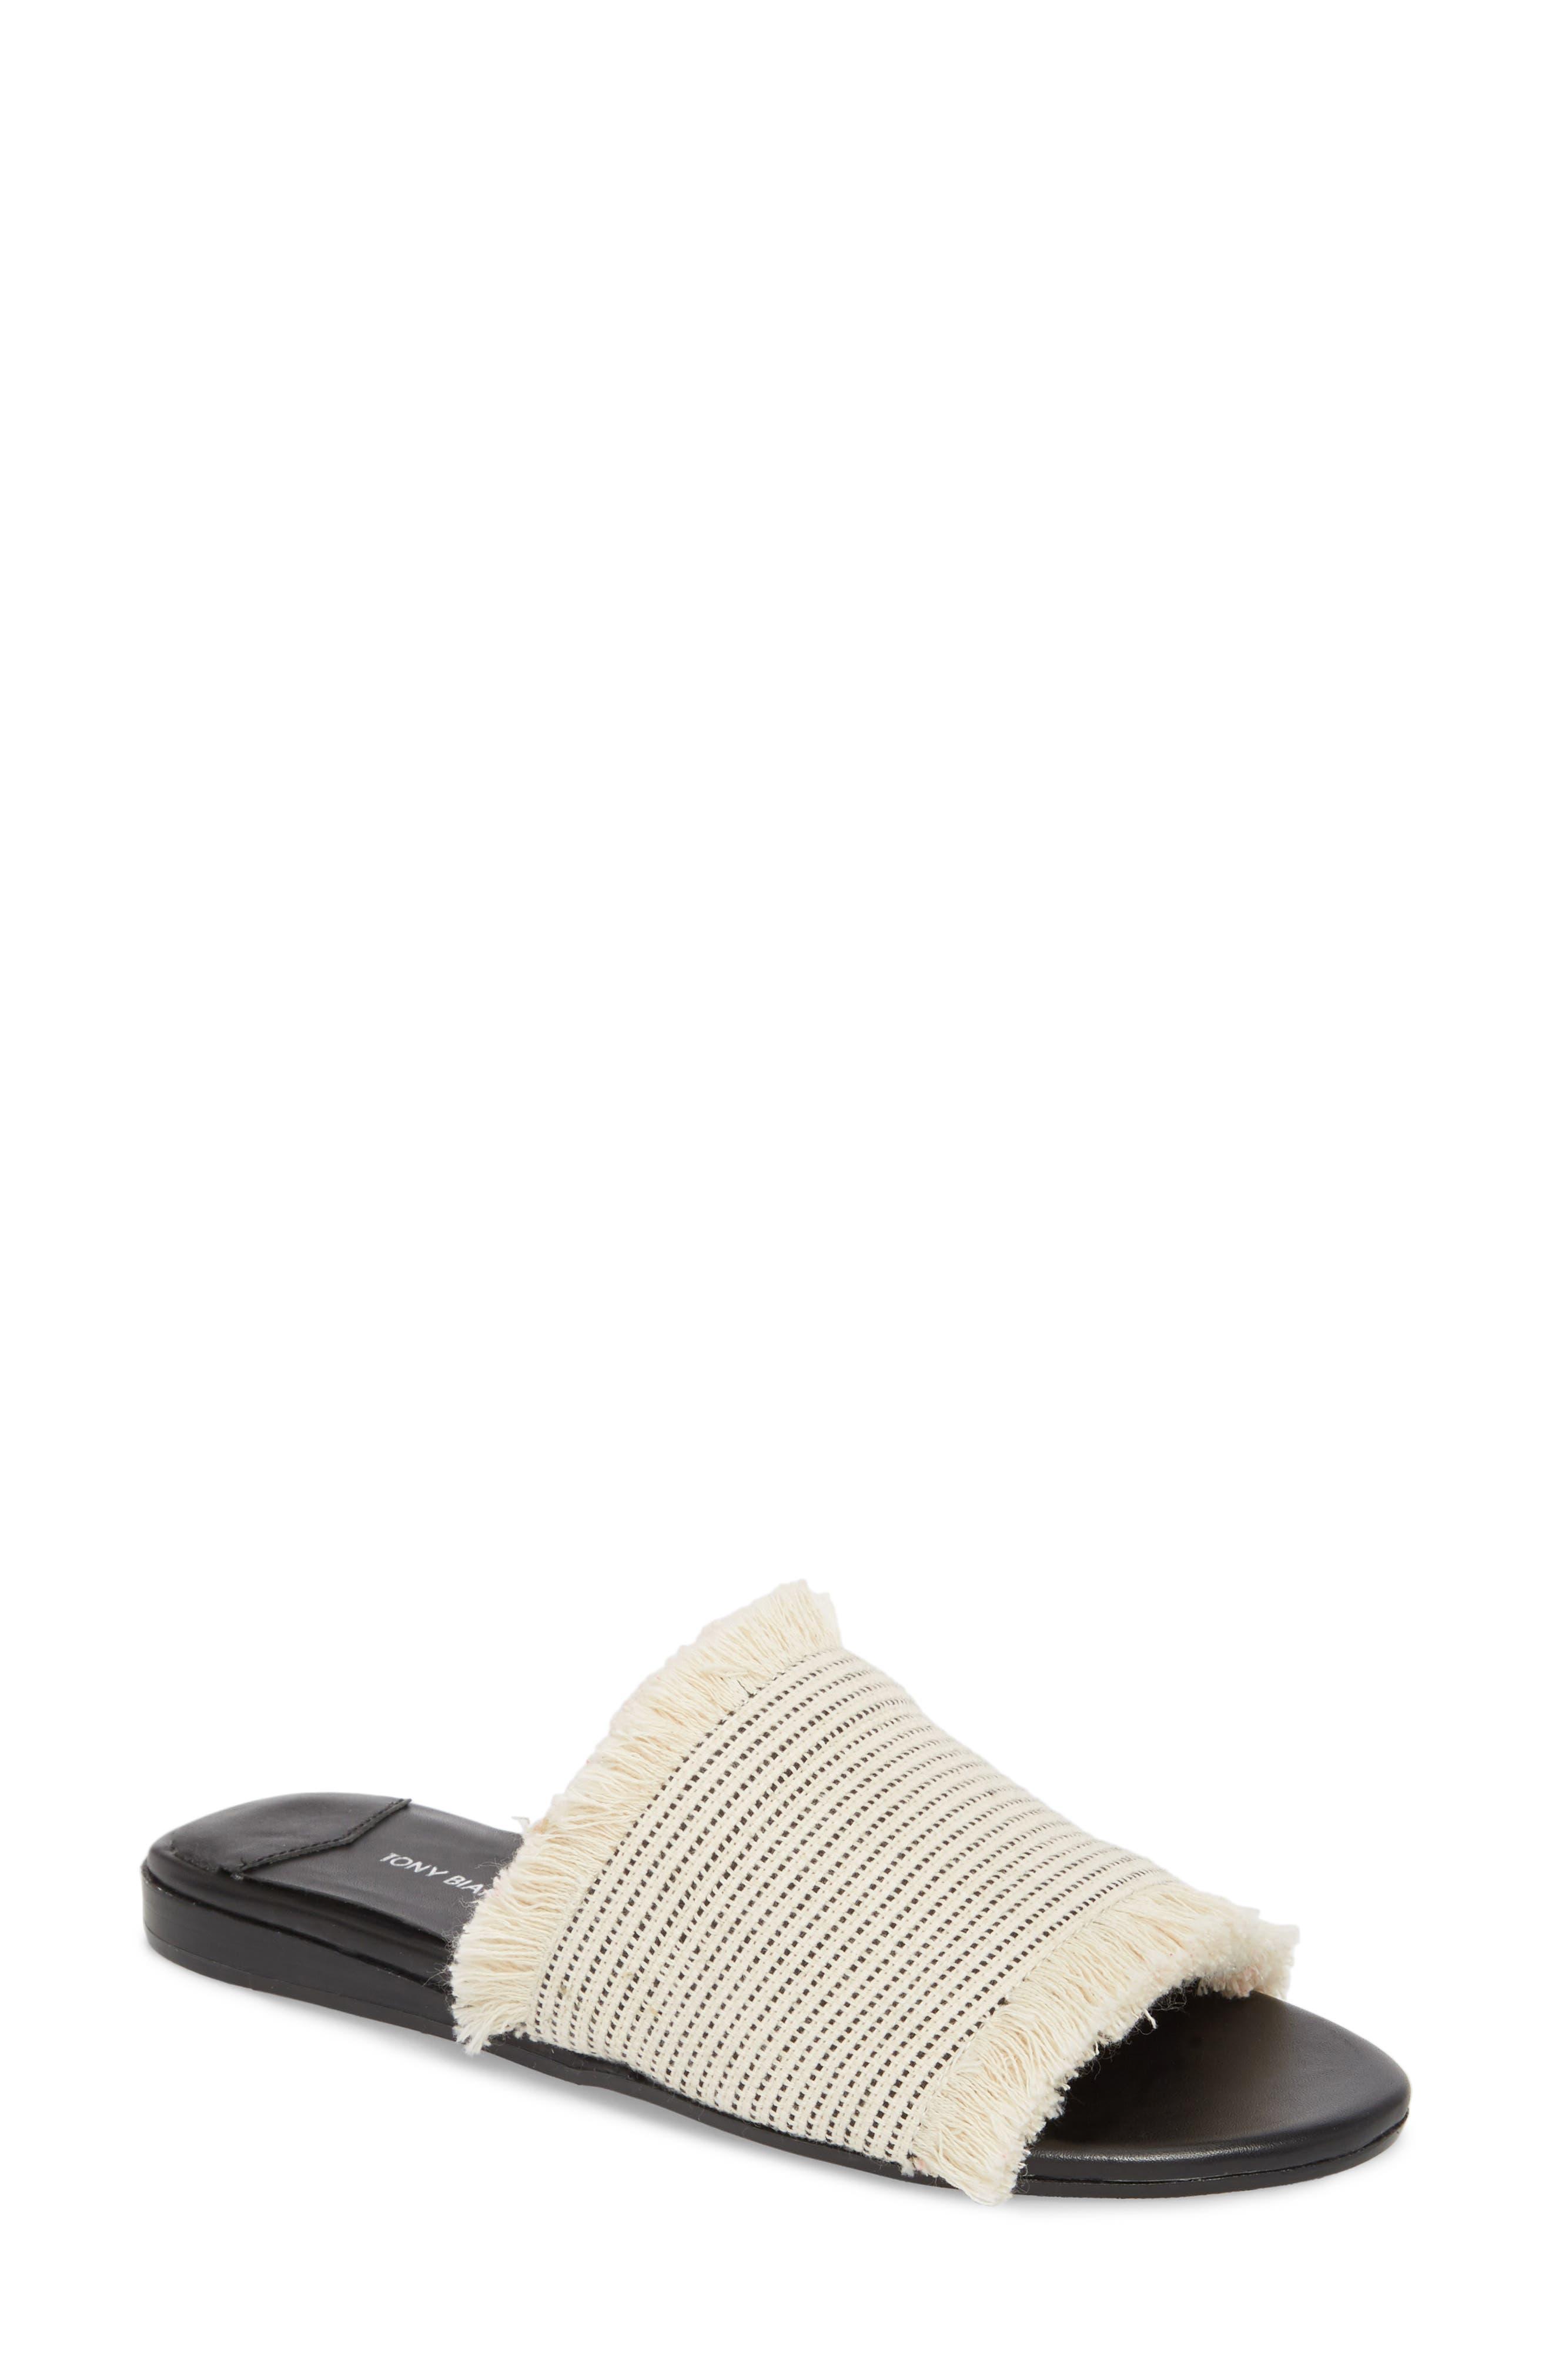 Tony Bianco Jayd Slide Sandal- White